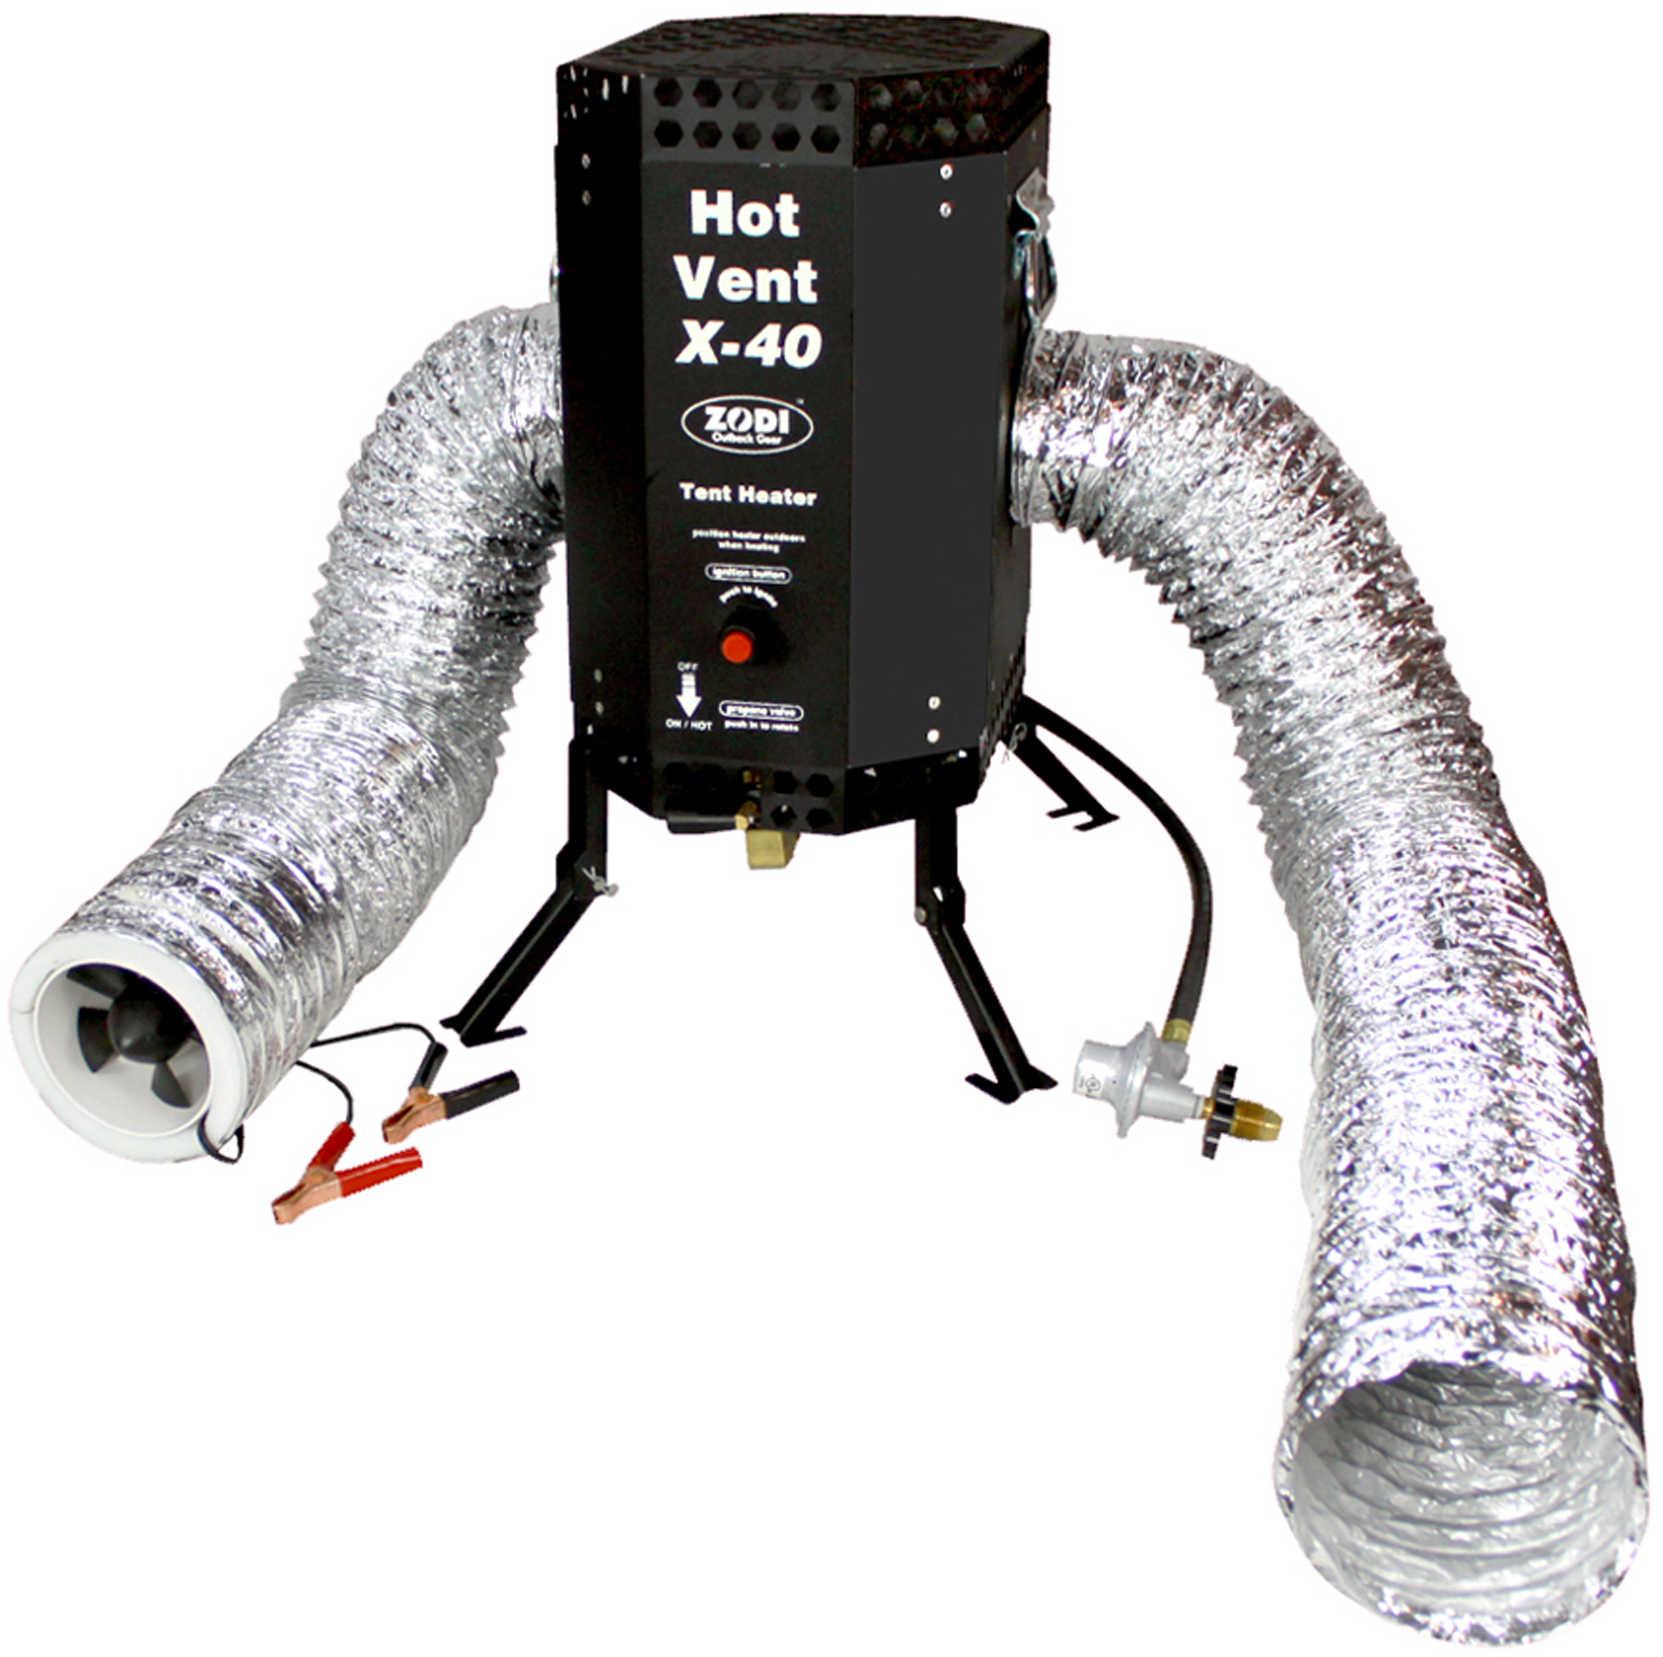 Zodi Outback Gear Zodi X-40 Hot Vent Tent Heater Md: 5148